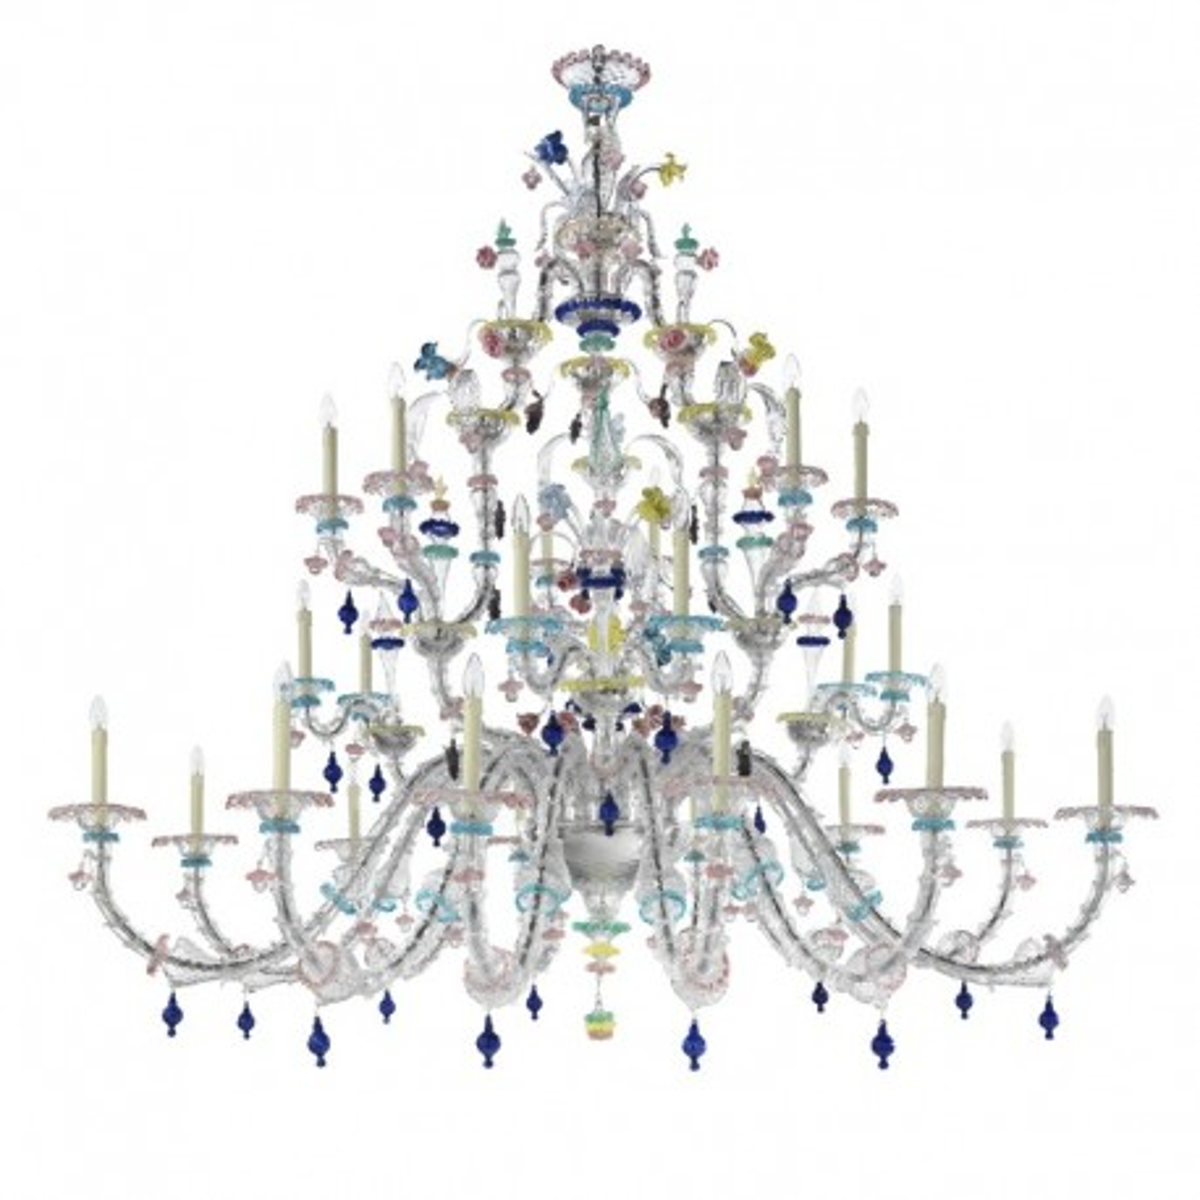 Aurora 24 lights classic Murano chandelier - transparent polychrome color